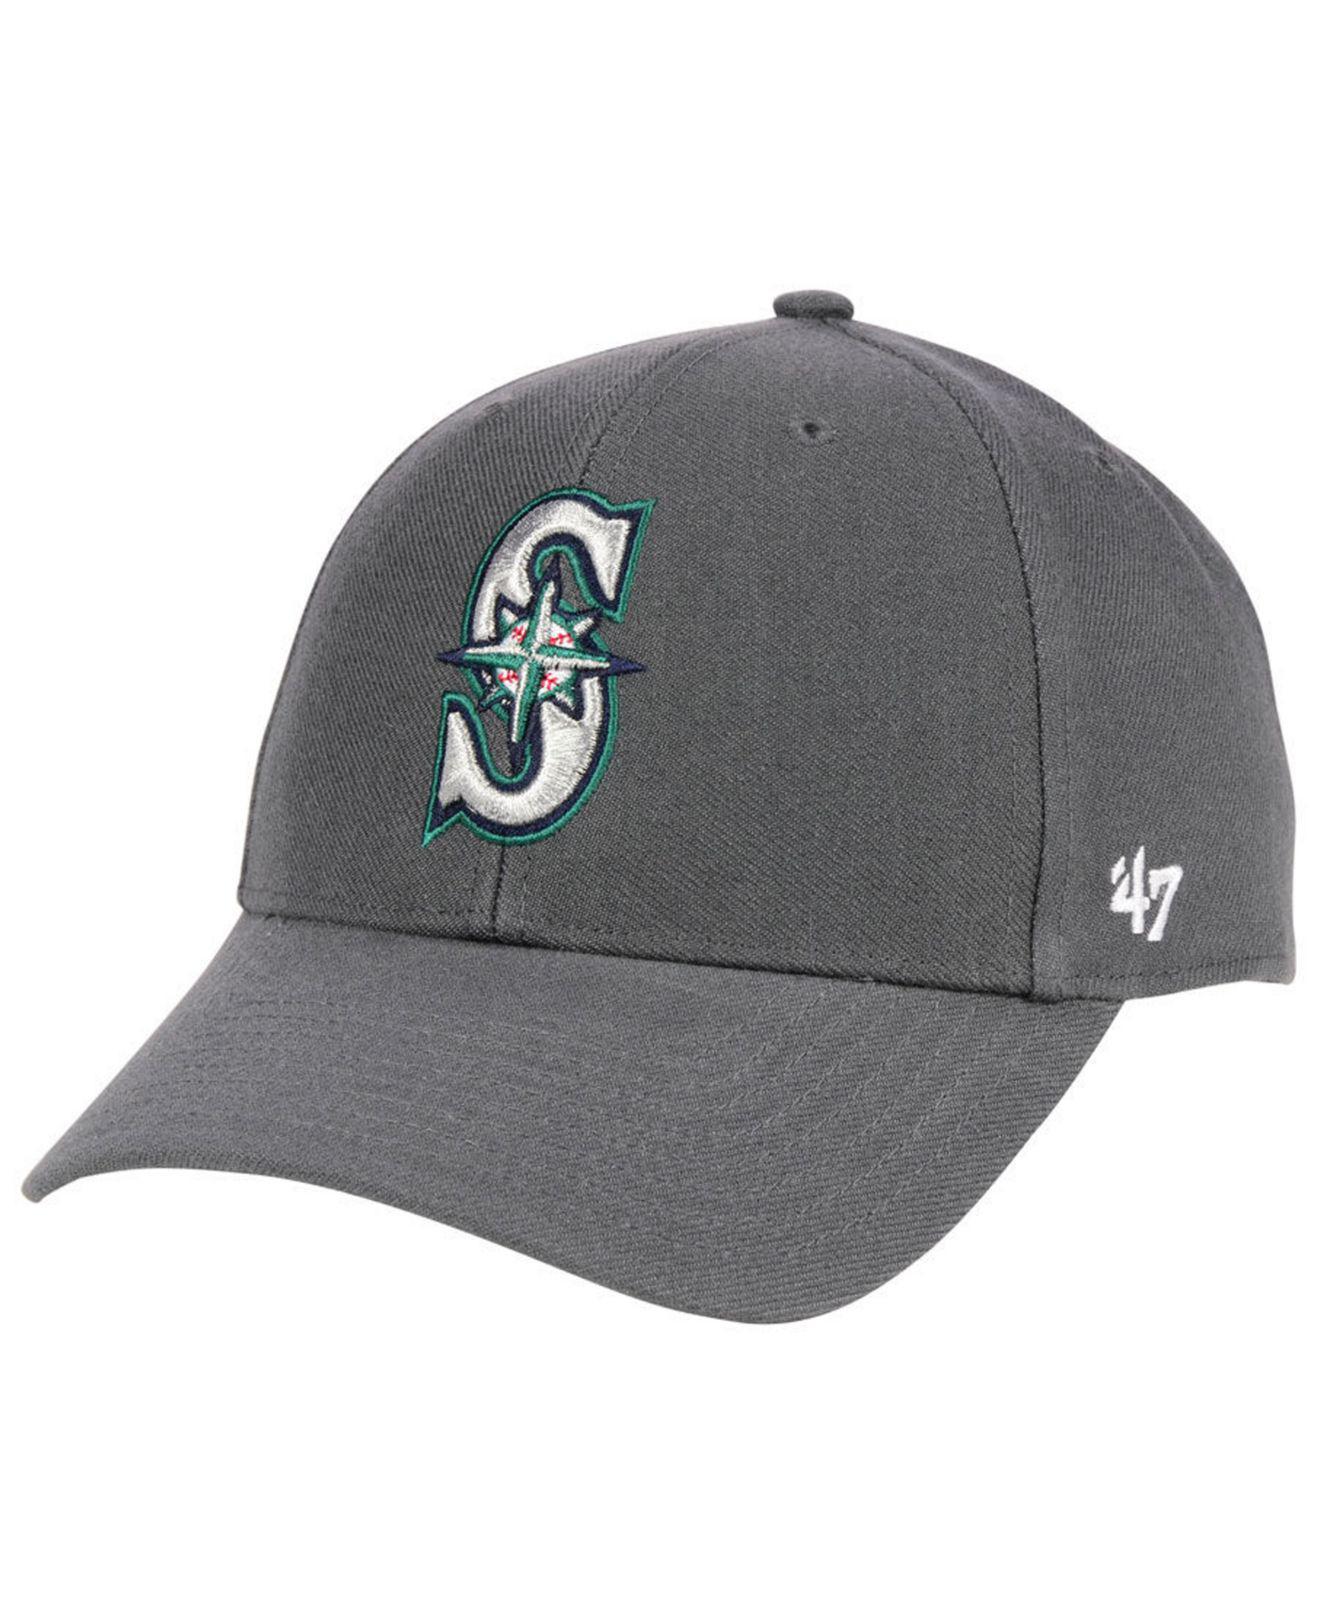 new style 5c271 4b15f 47 Brand. Men s Gray Seattle Mariners Charcoal Mvp Cap